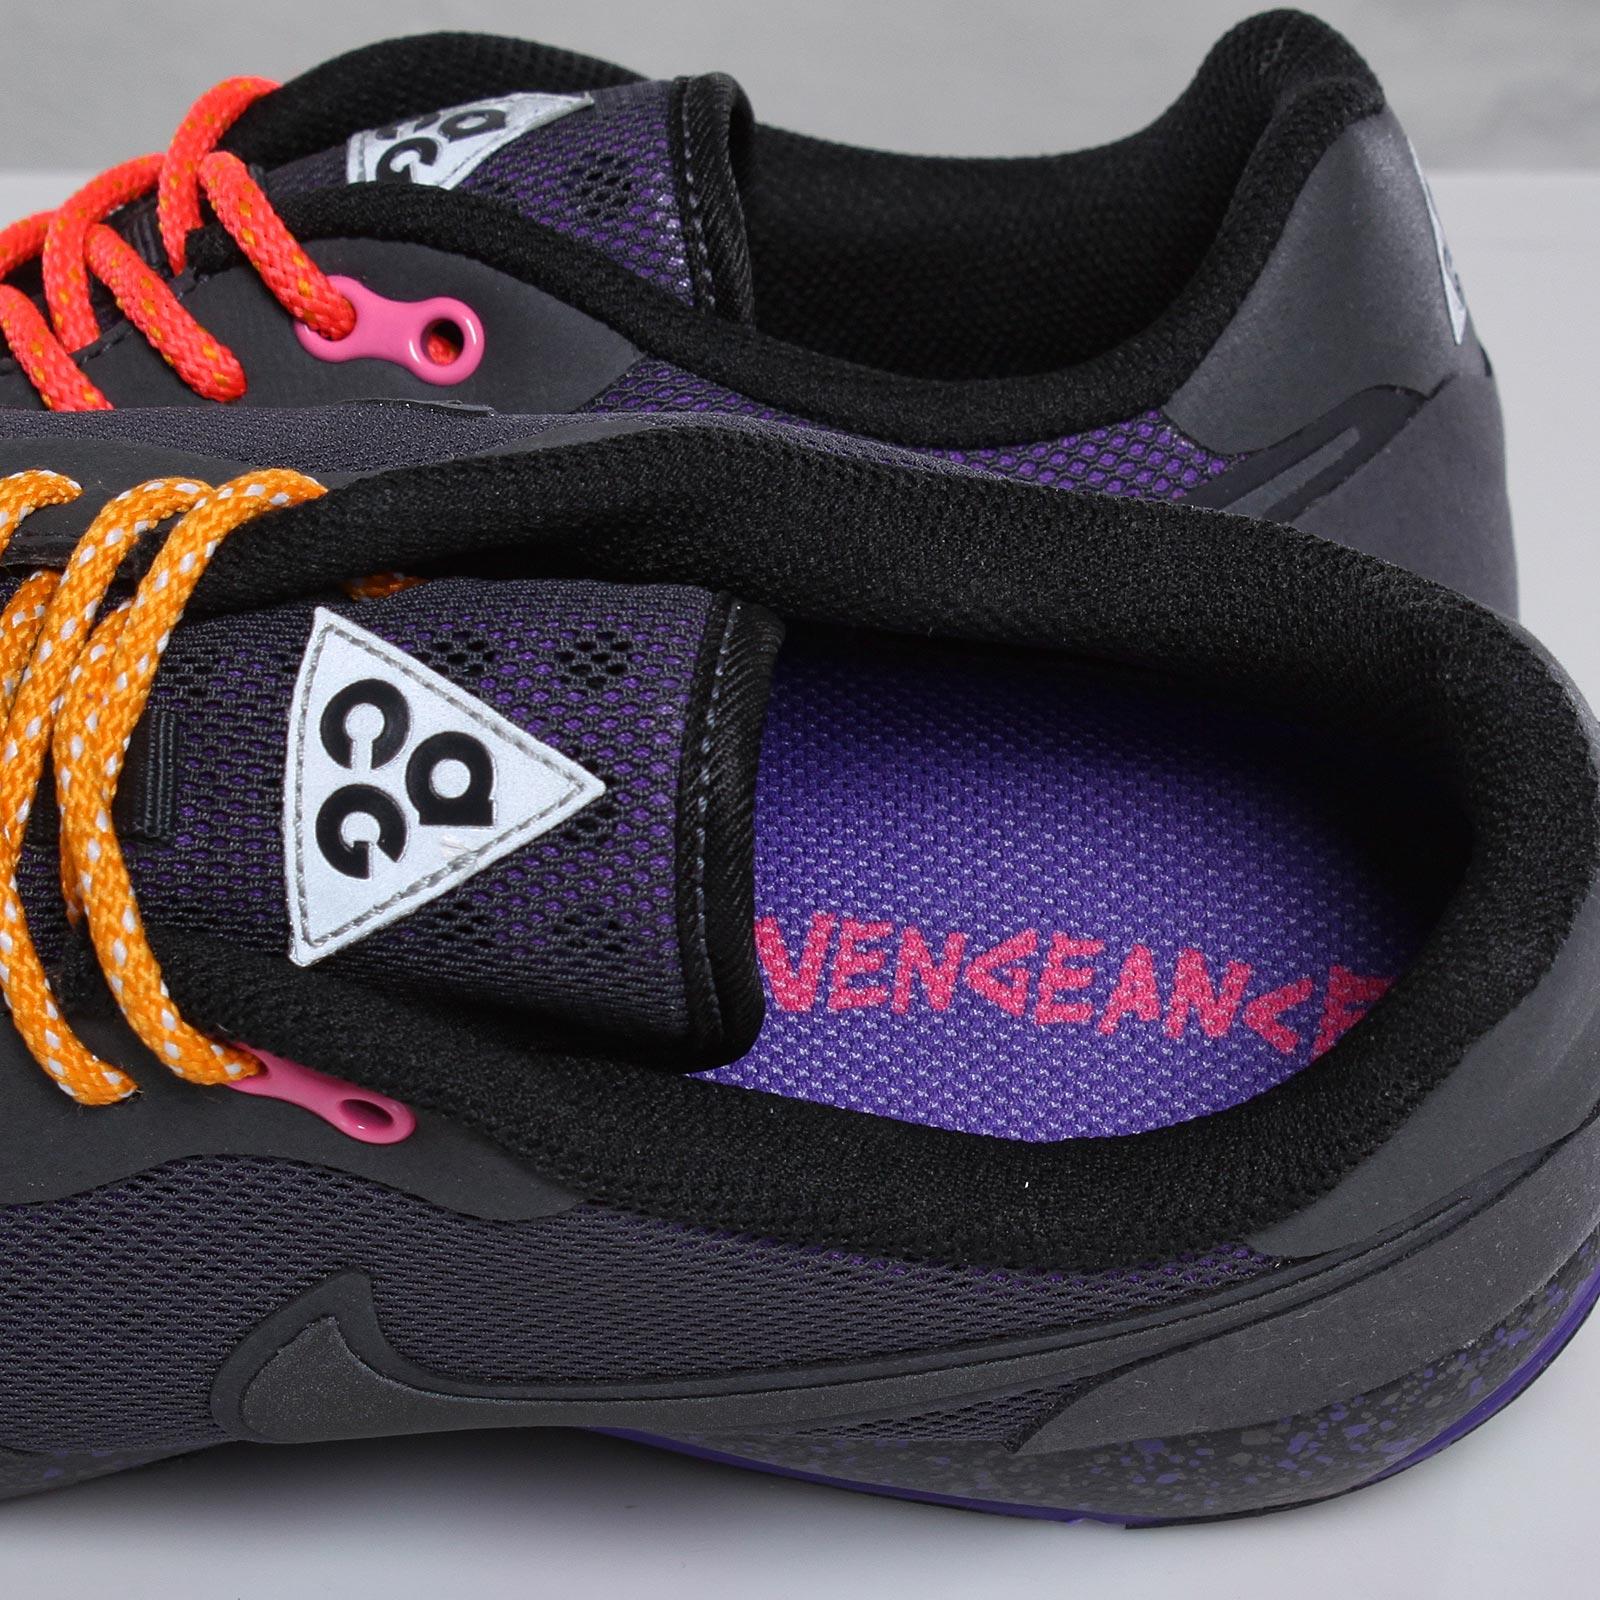 áspero Gran cantidad Ejército  Nike Lunar Vengeance Terra - 100686 - Sneakersnstuff | sneakers &  streetwear online since 1999